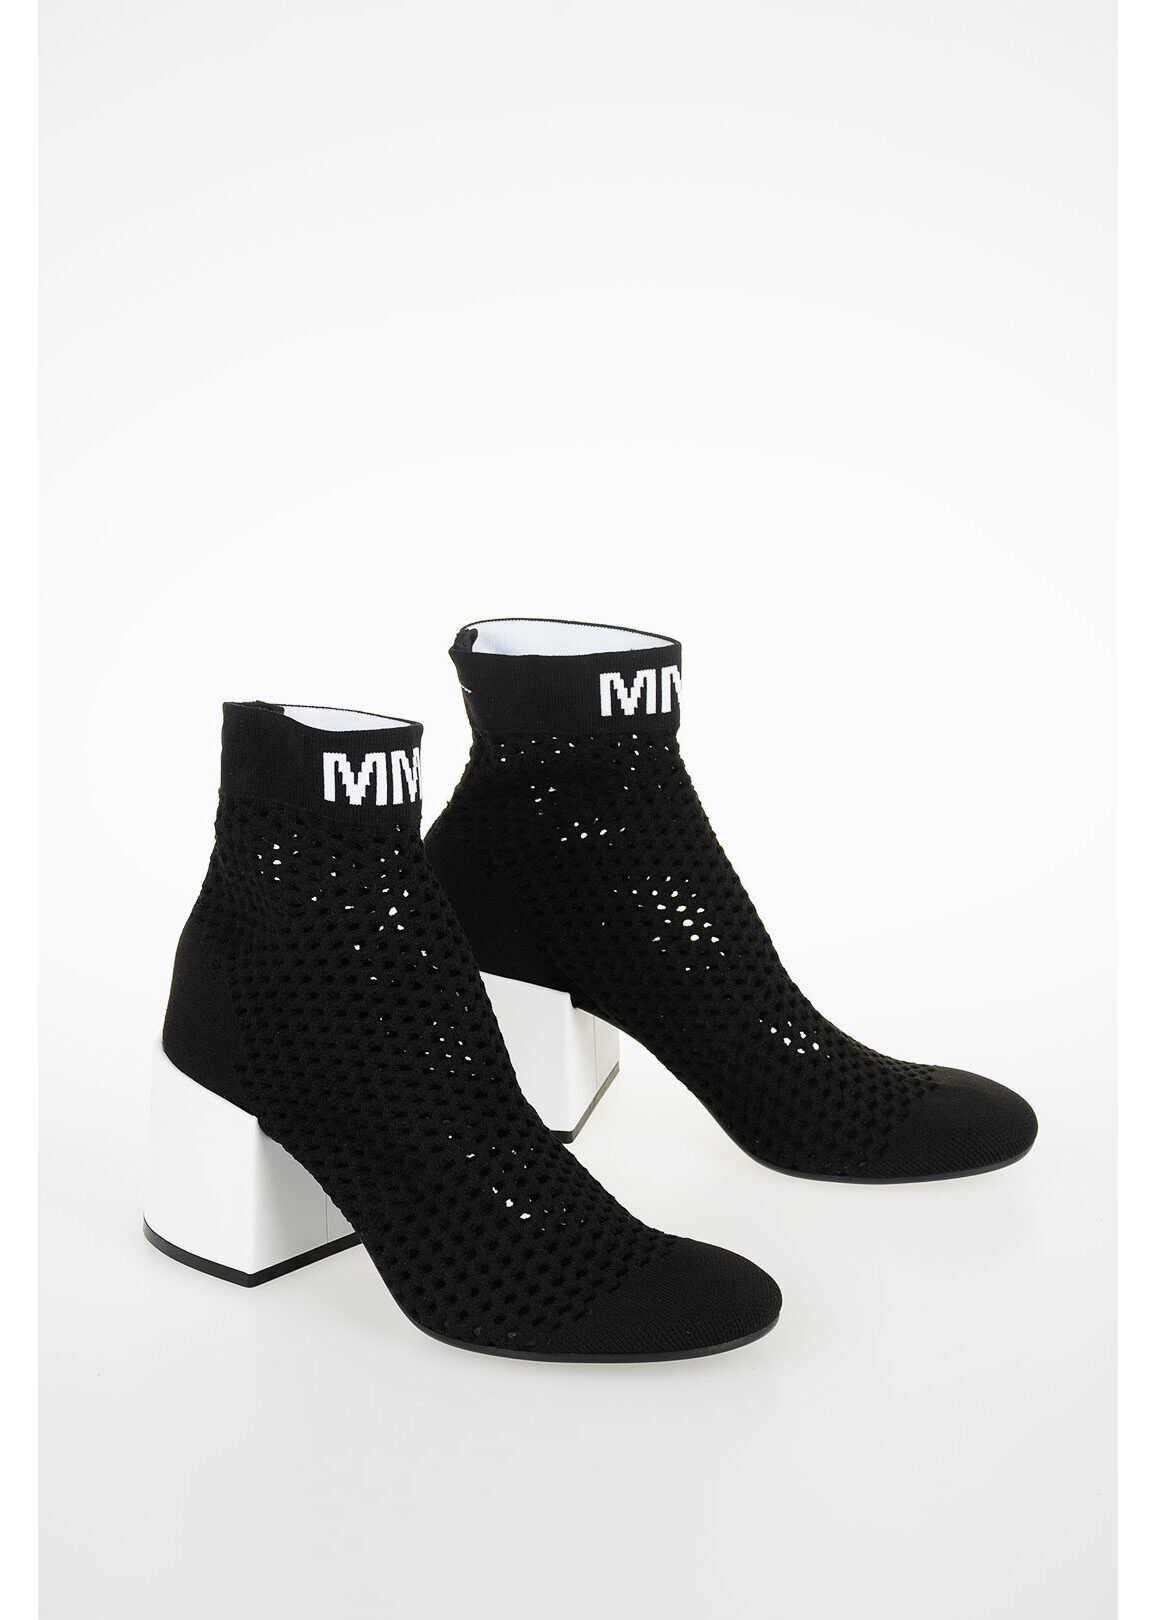 Maison Margiela MM6 7cm Openwork Ankle Boot BLACK